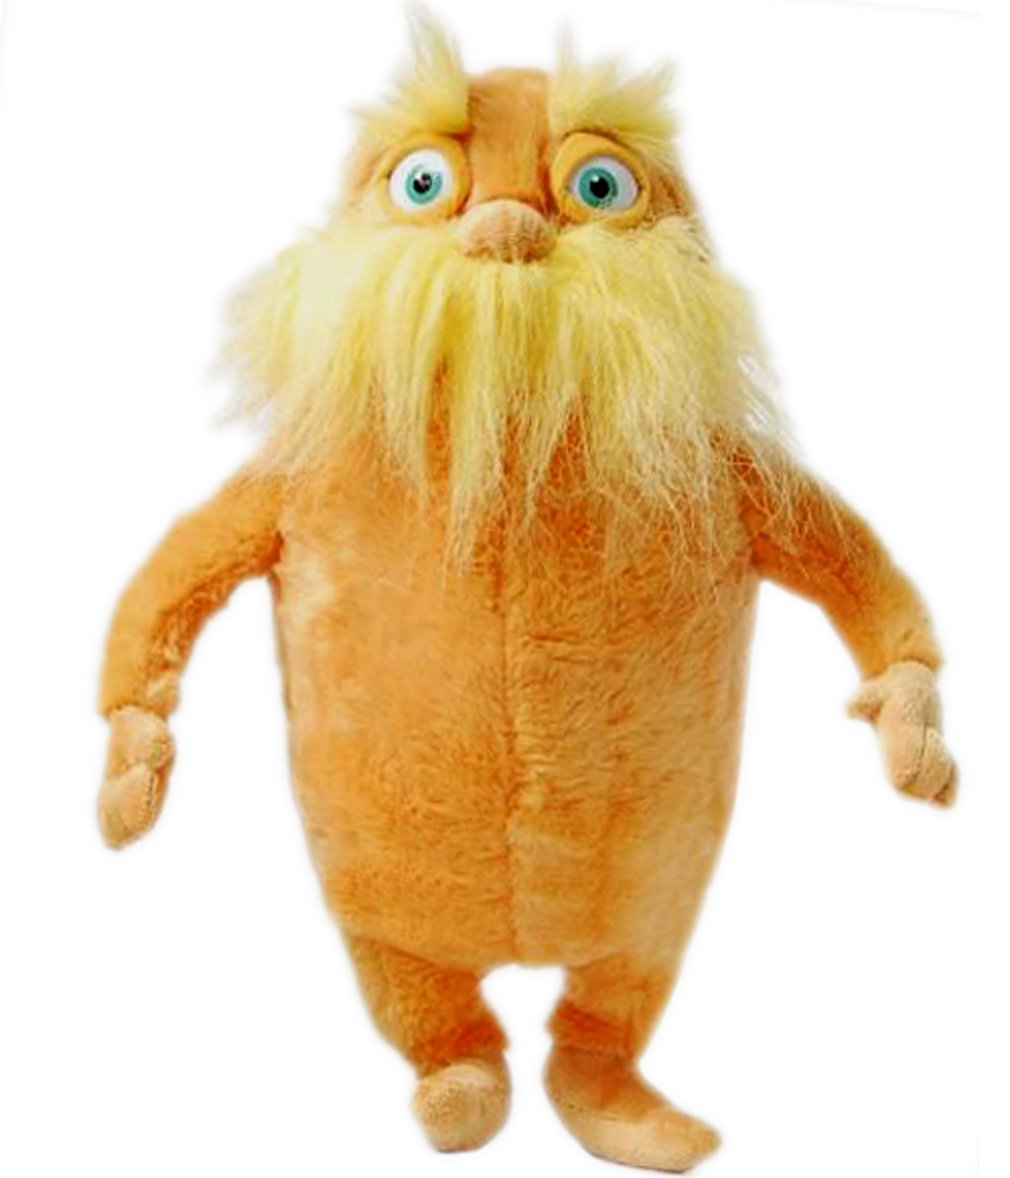 Muaquata The Lorax Soft Plush Stuffed Animals Collection Toy